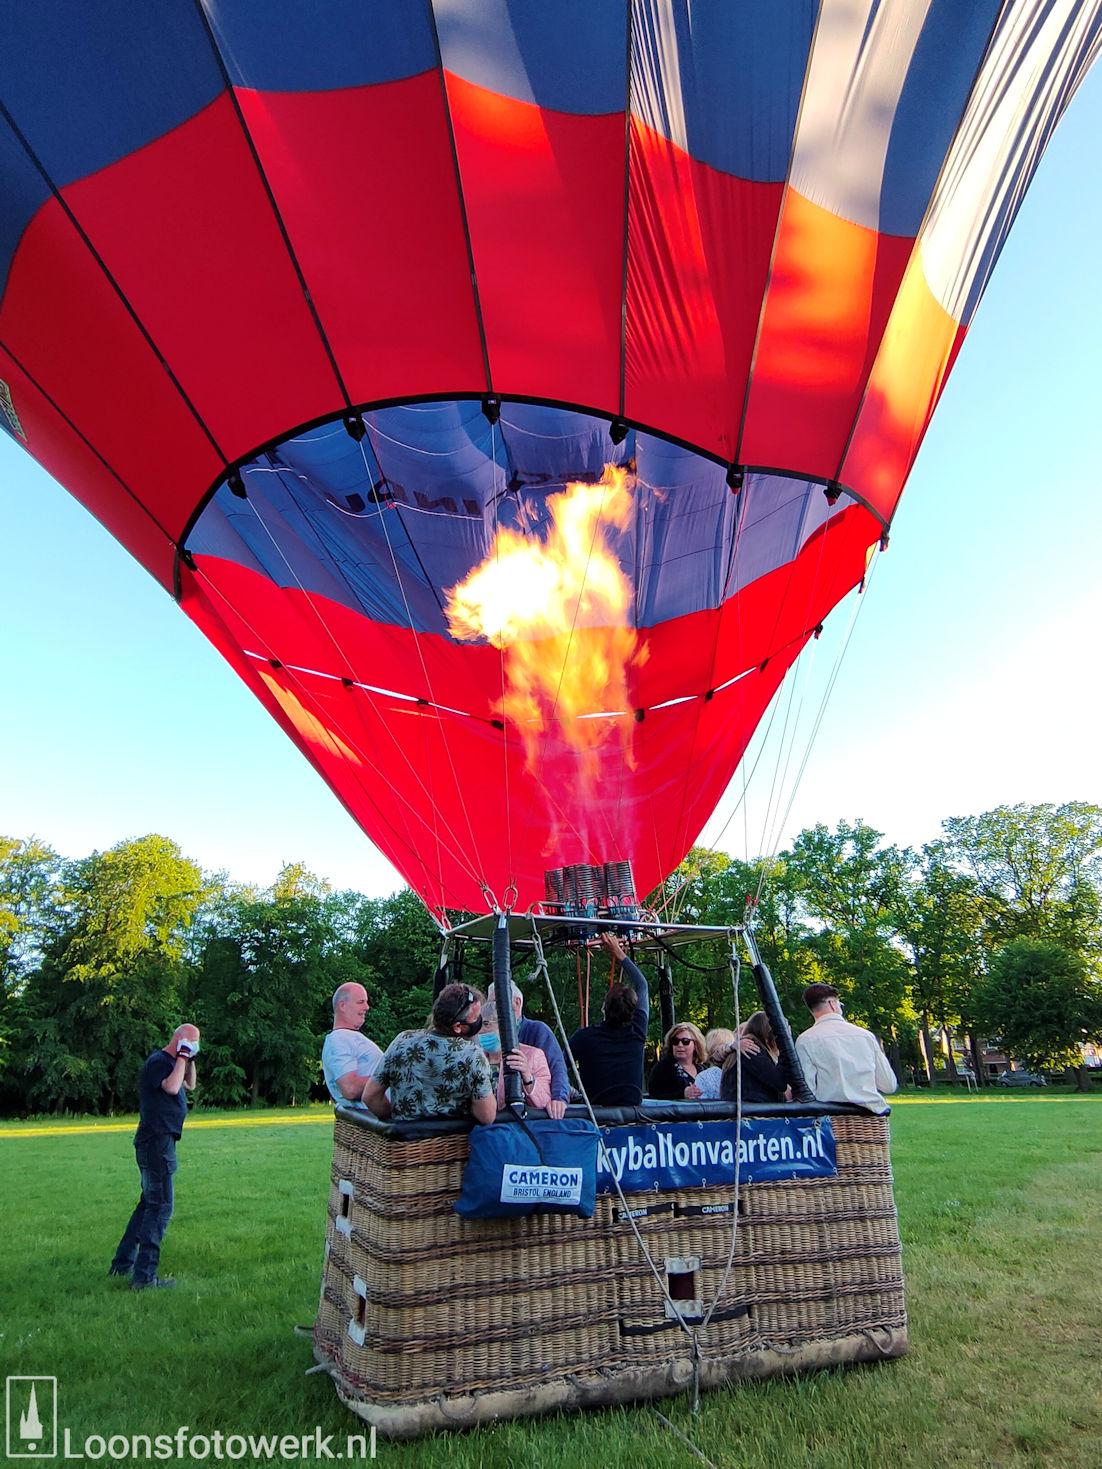 Ballonvaart vanaf de Kasteelweide 24